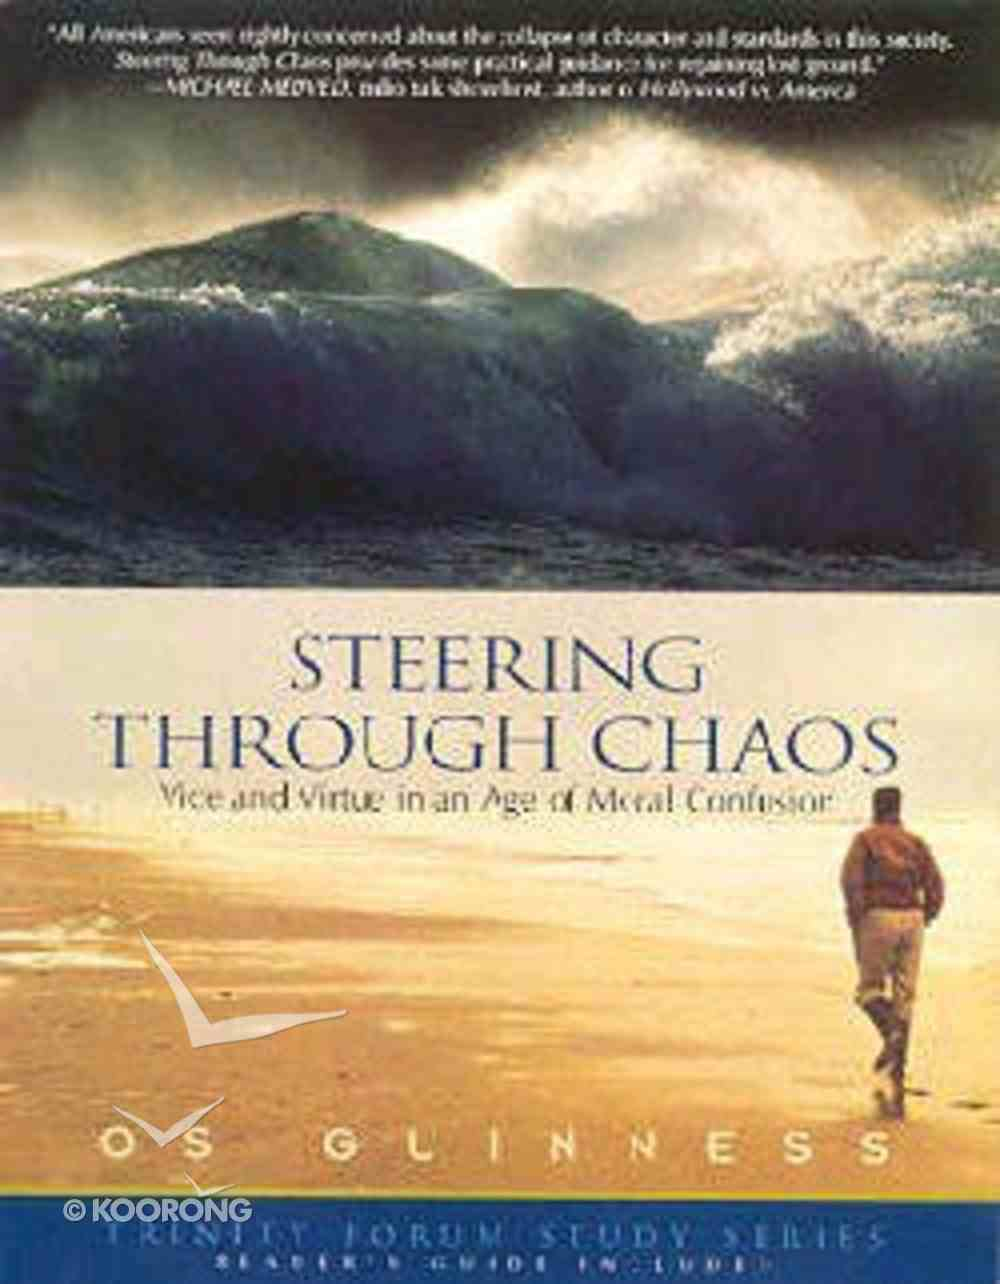 Steering Through Chaos (Trinity Forum Study Series) Paperback